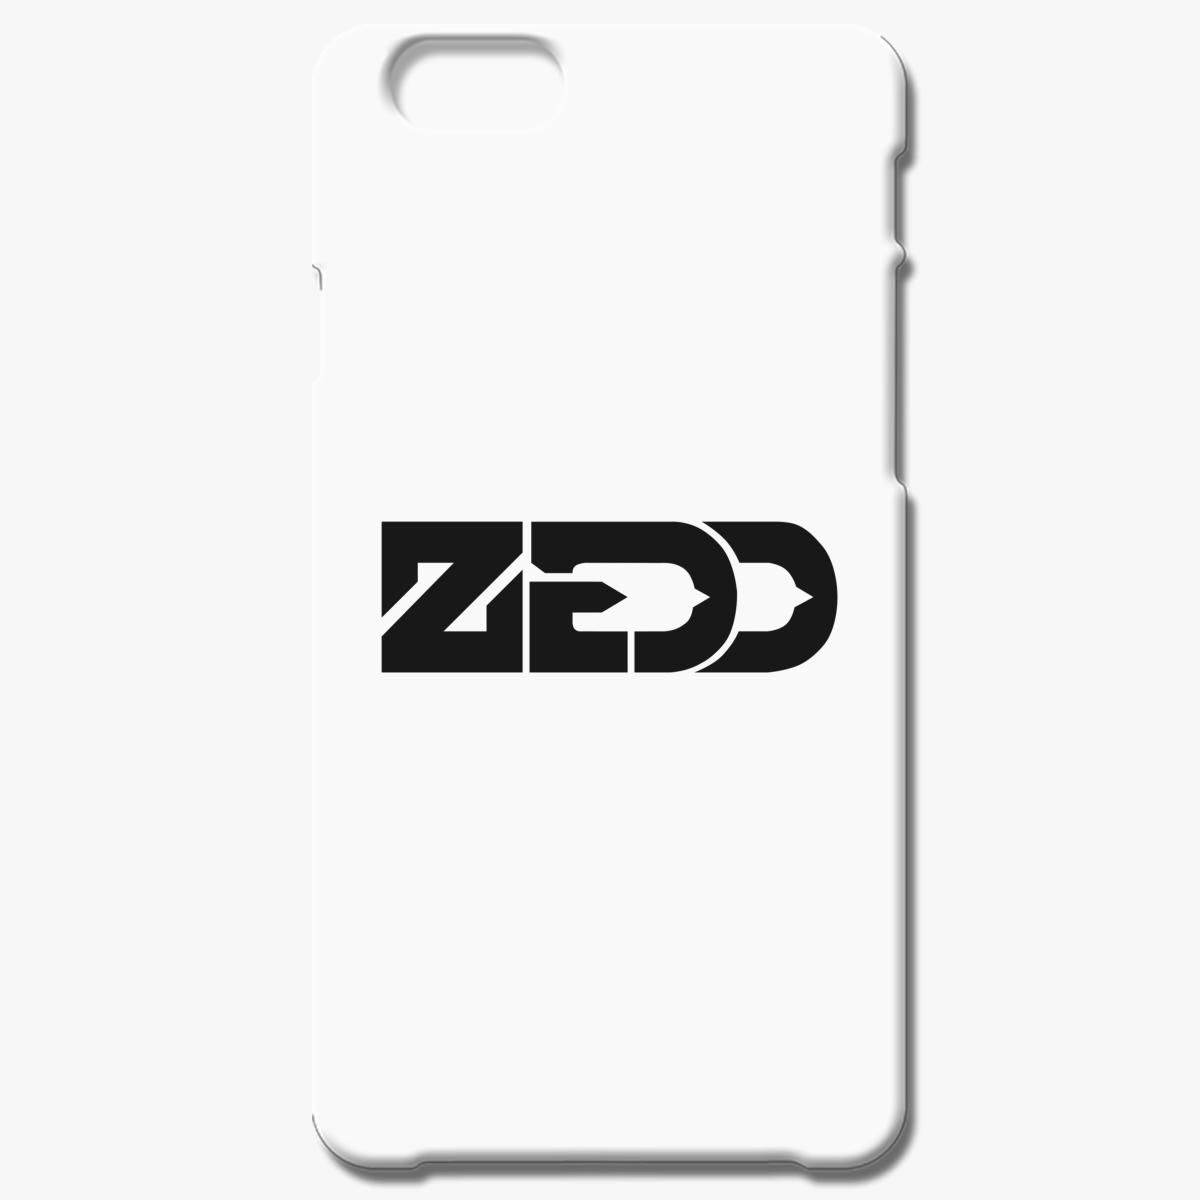 Zedd Iphone 7 Plus Case